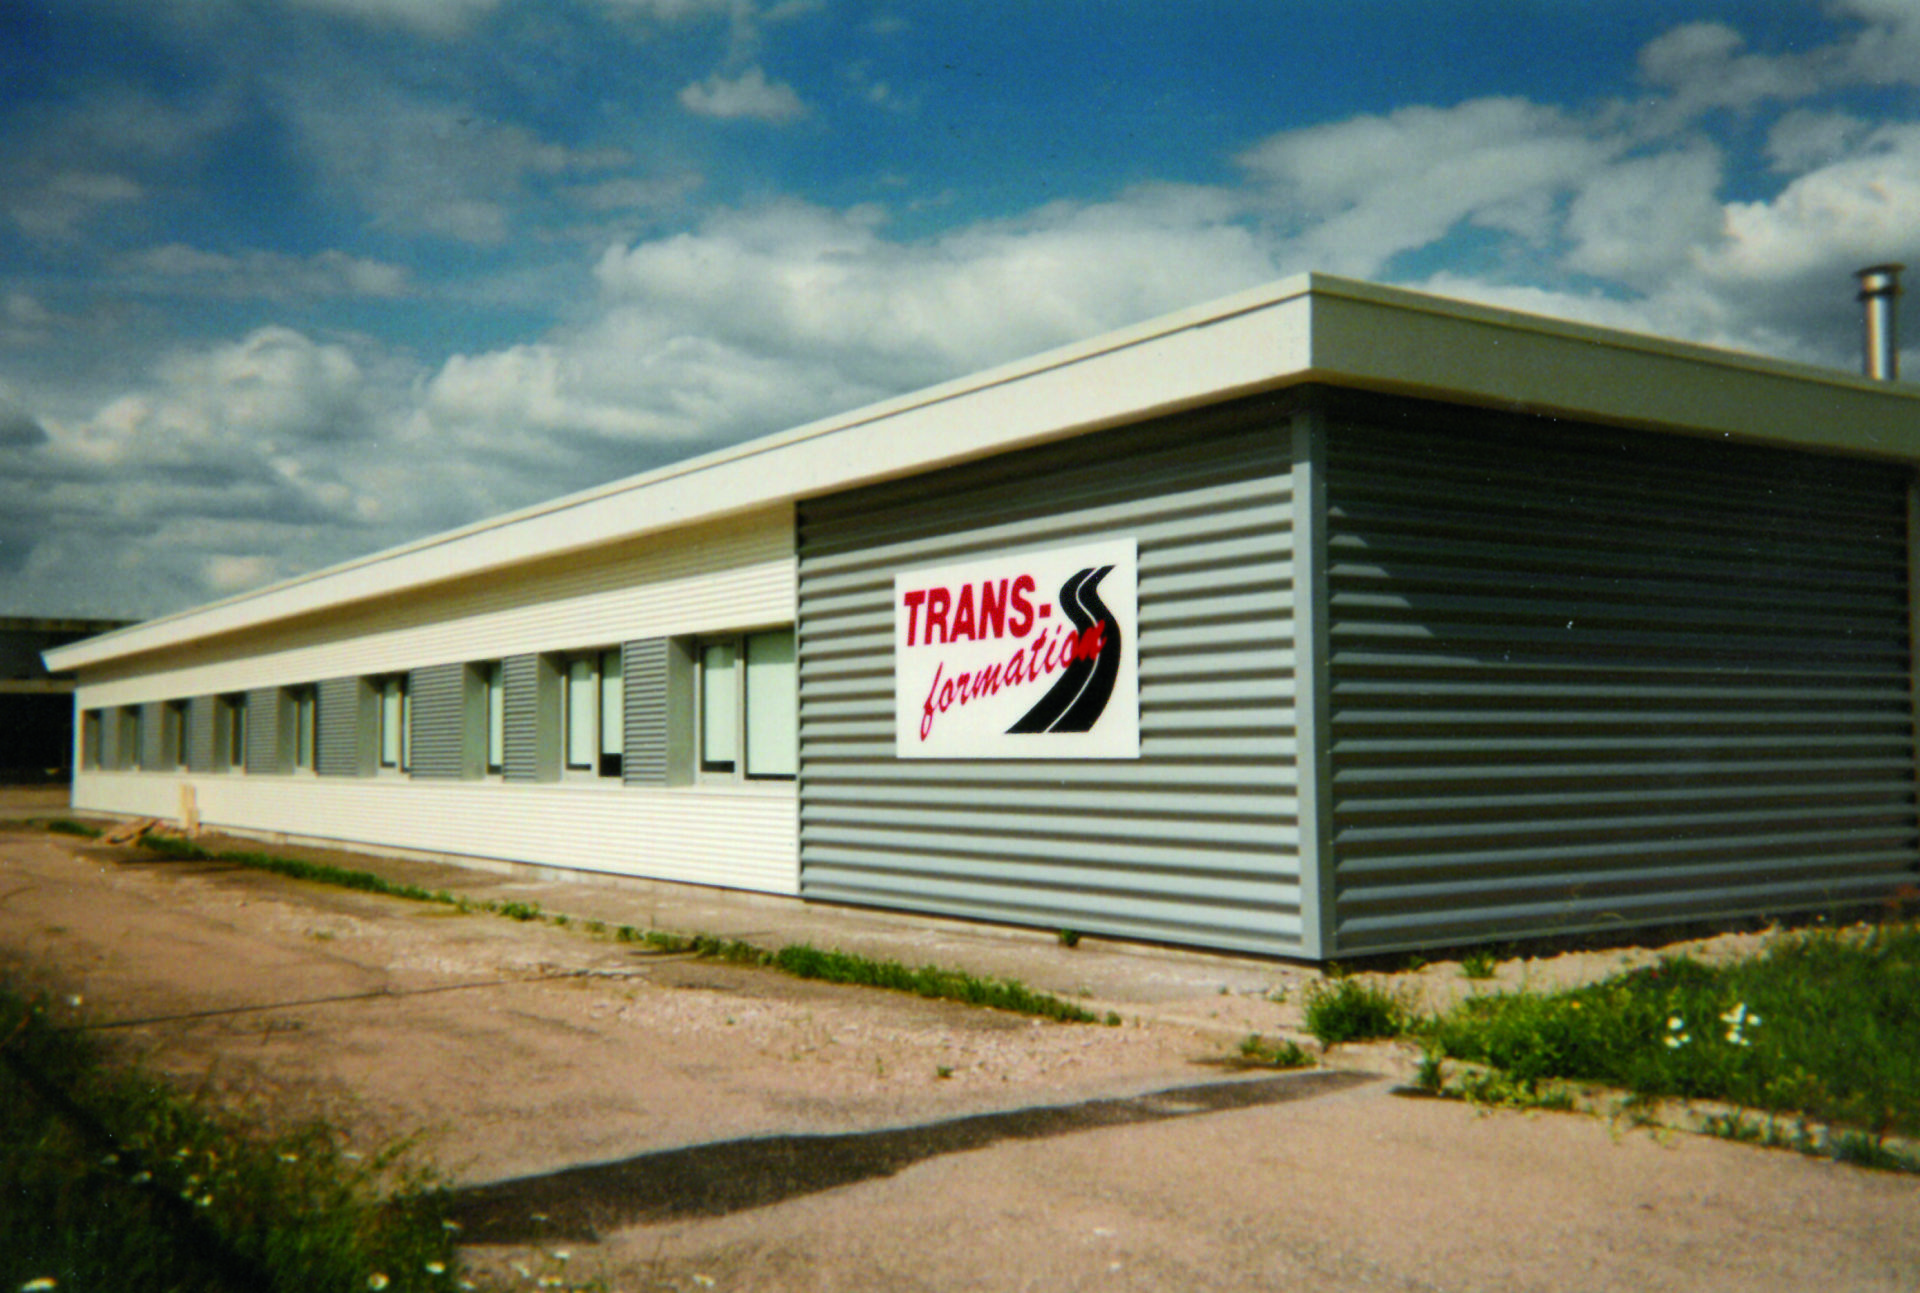 Groupe-Mauffrey-notre-histoire-trans-formation-juin-1999